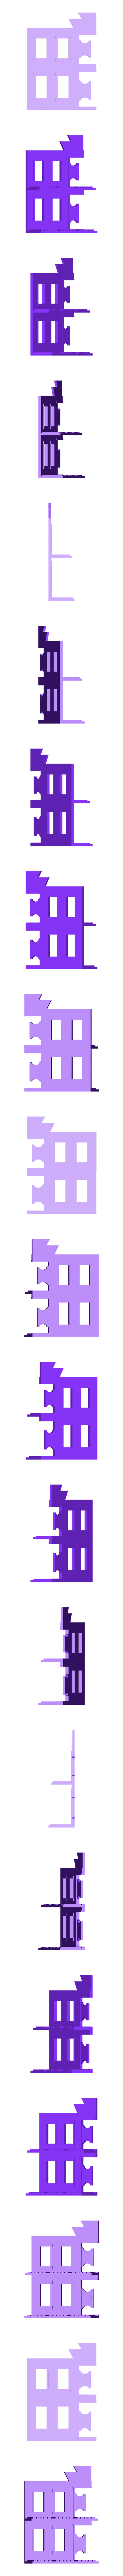 WT_Saloon_Left.stl Download free STL file Western Town • 3D print model, mrhers2